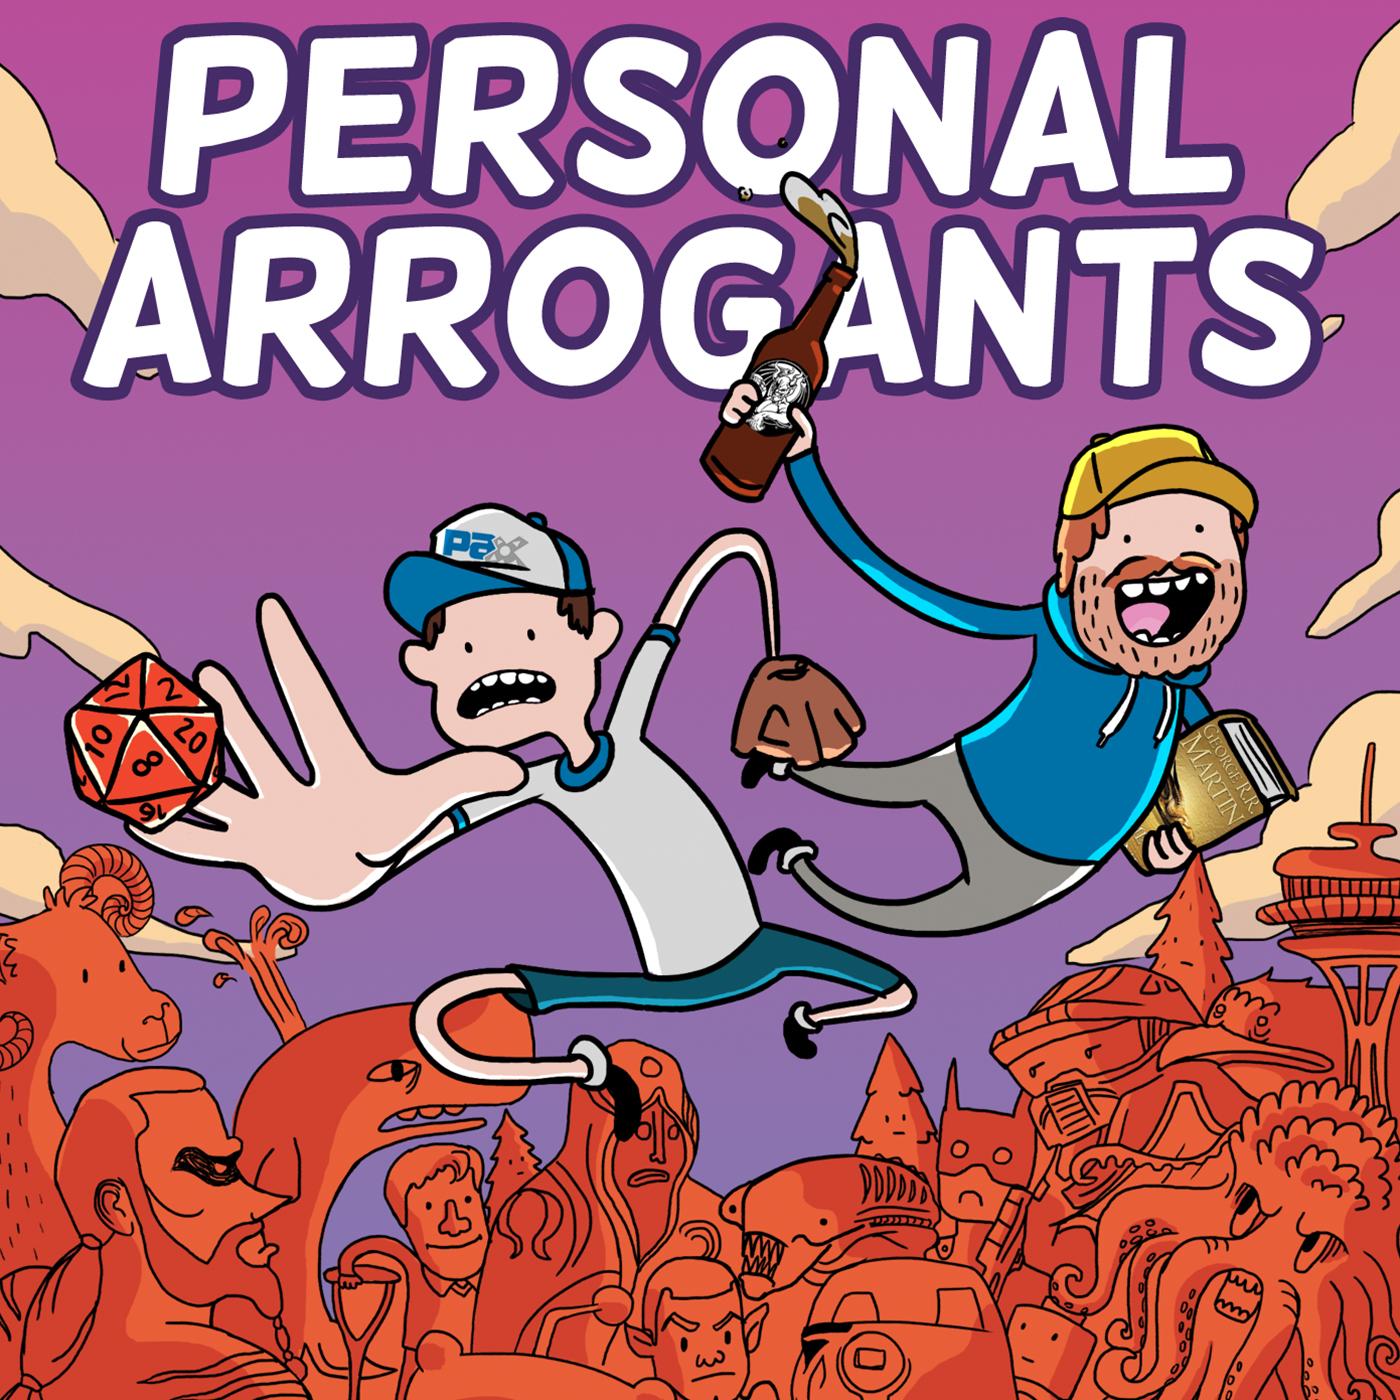 Personal Arrogants